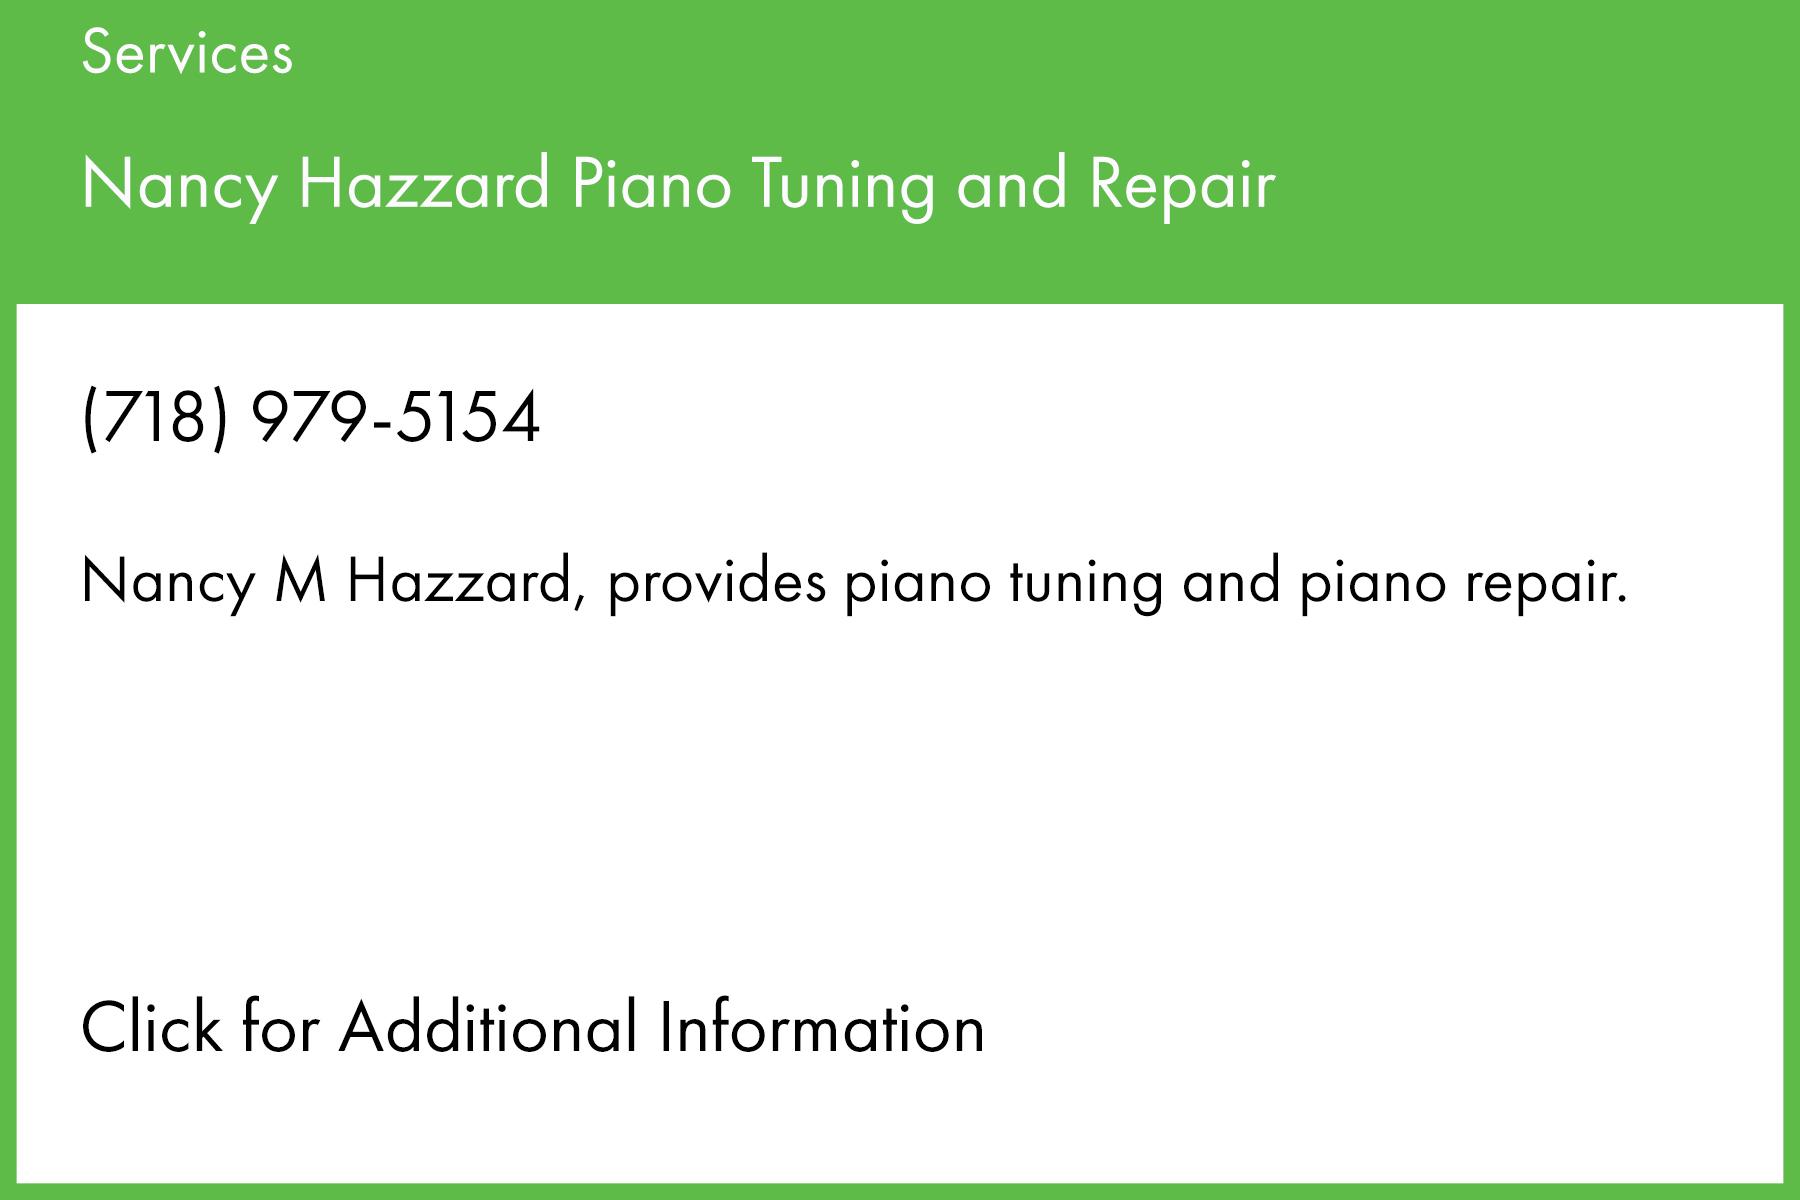 Resource Directory - Nancy Hazzard Piano Tuning and Repair.jpg